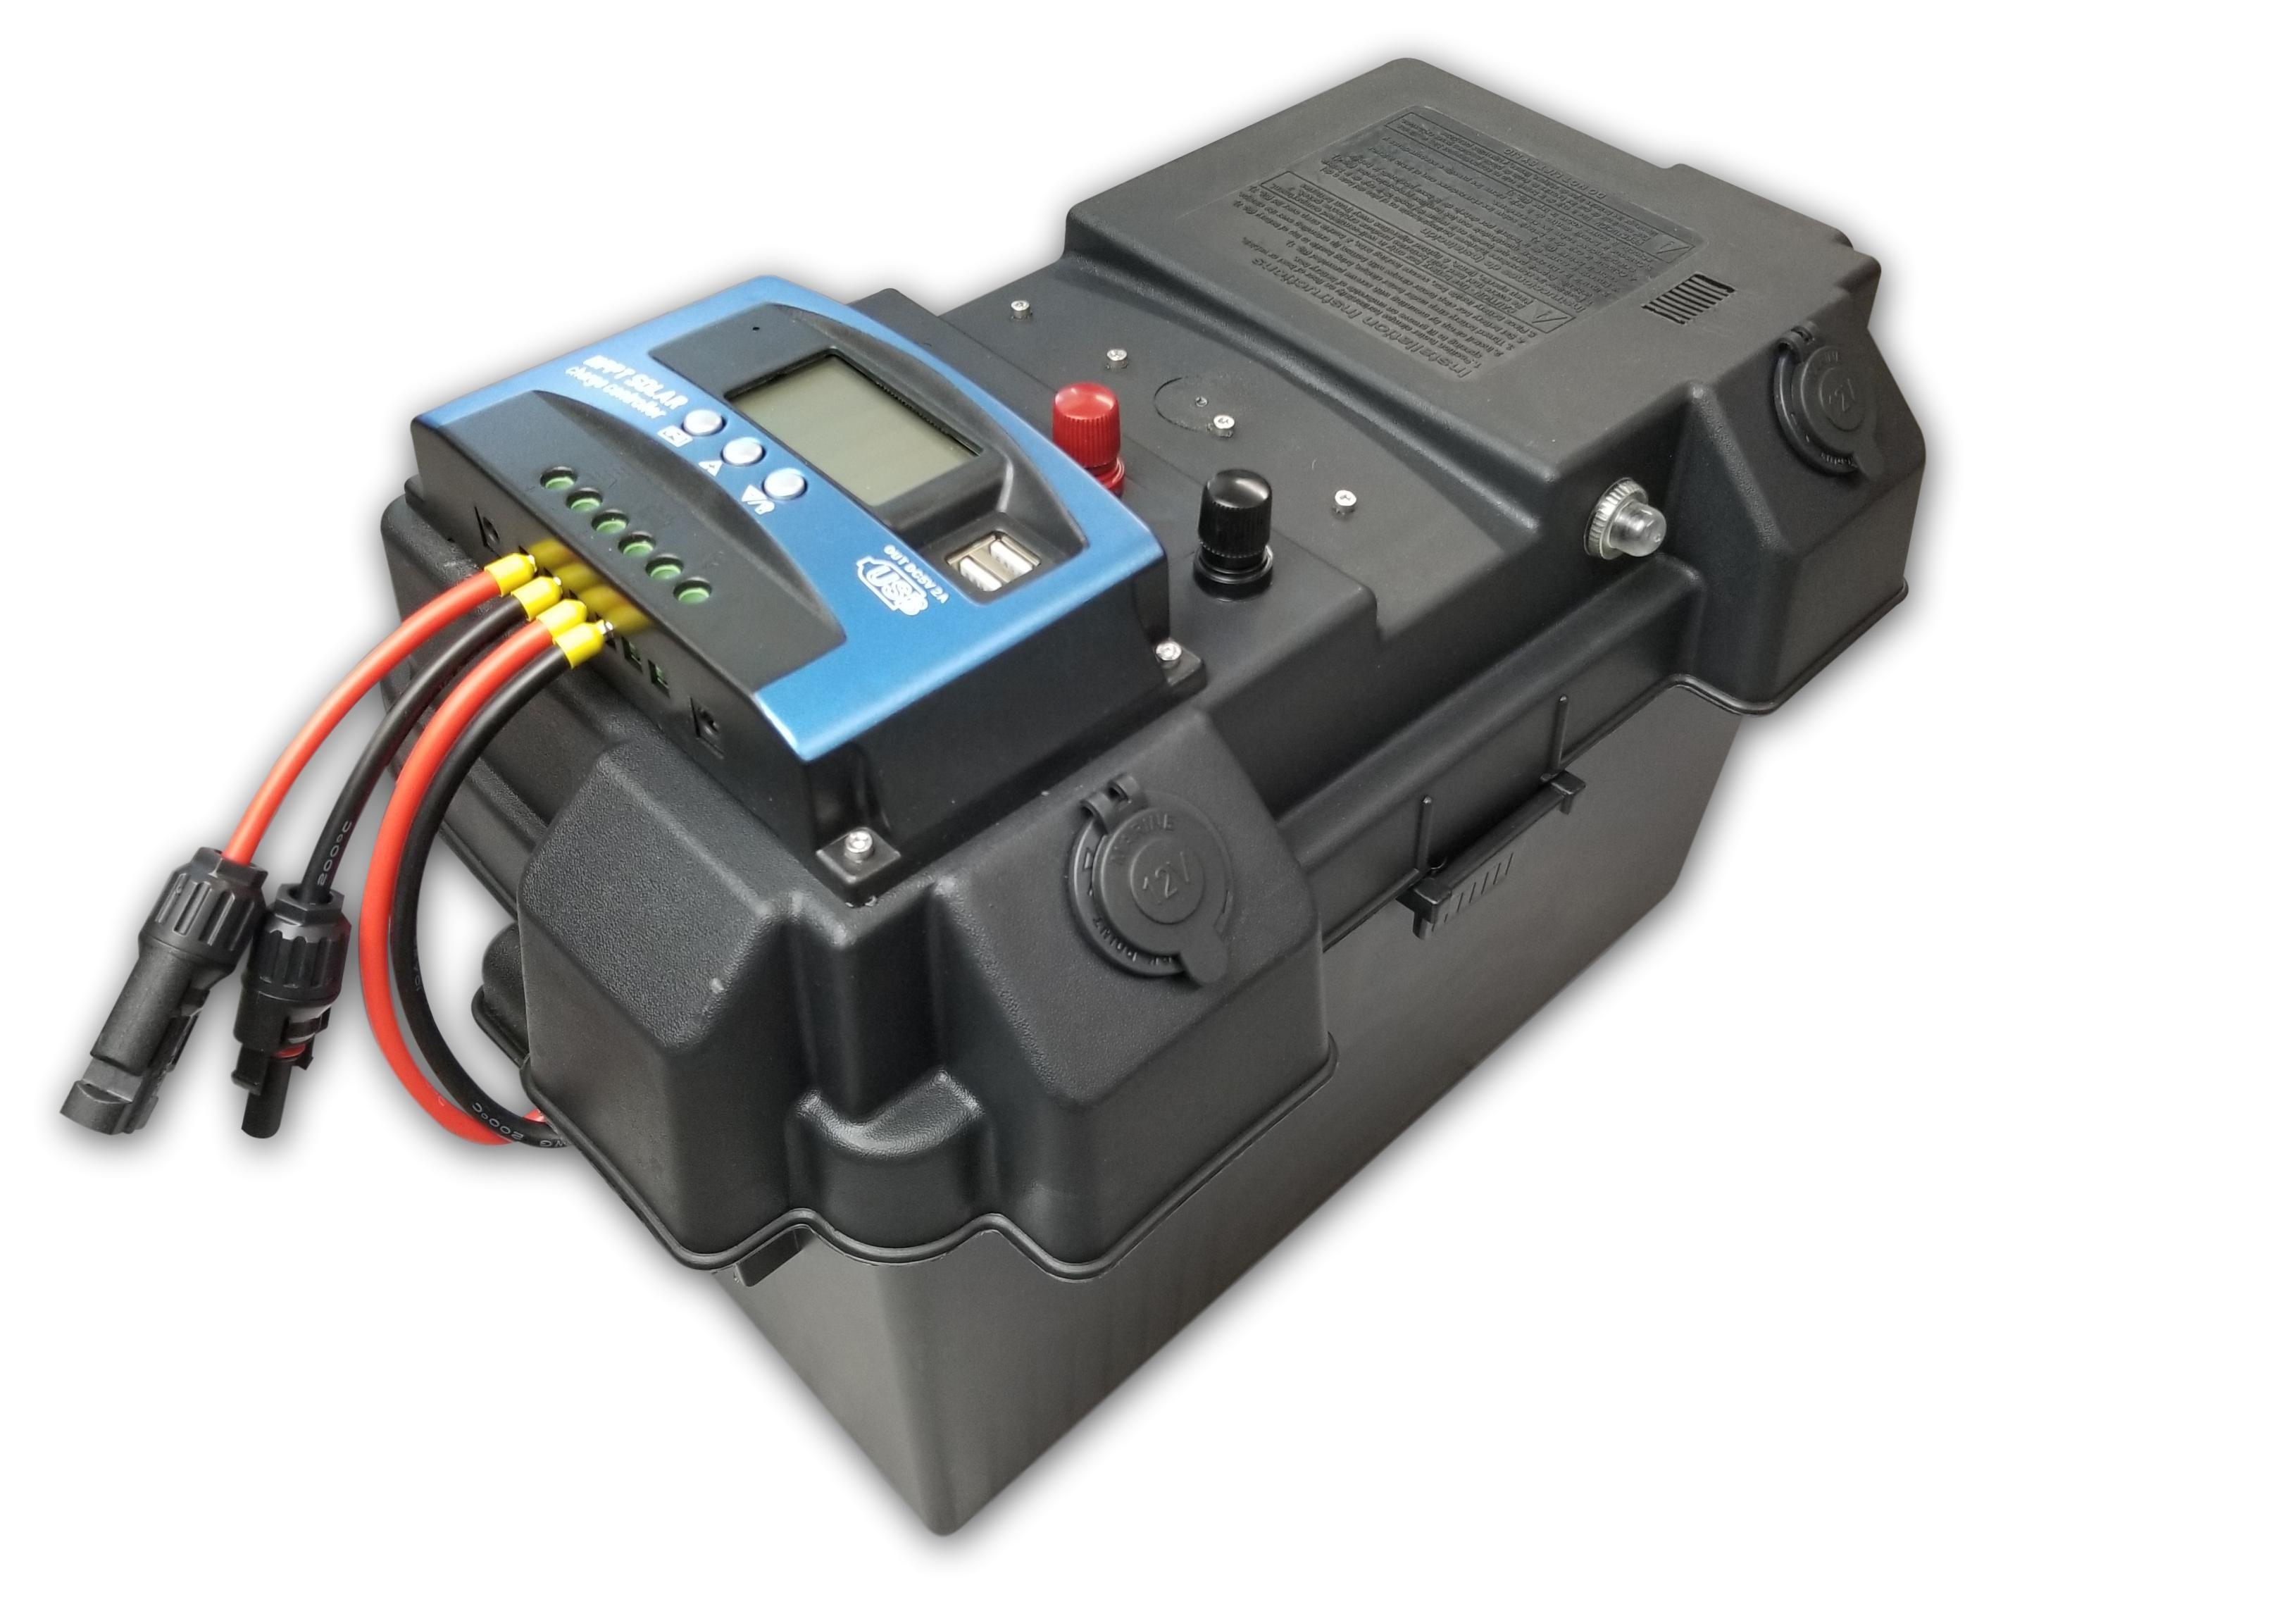 1200w 2400w Mppt Solar Generator Portable Solar Battery Box 12v Or 24v 100a Input Usb In 2020 Solar Battery Solar Generator Solar Panel Battery